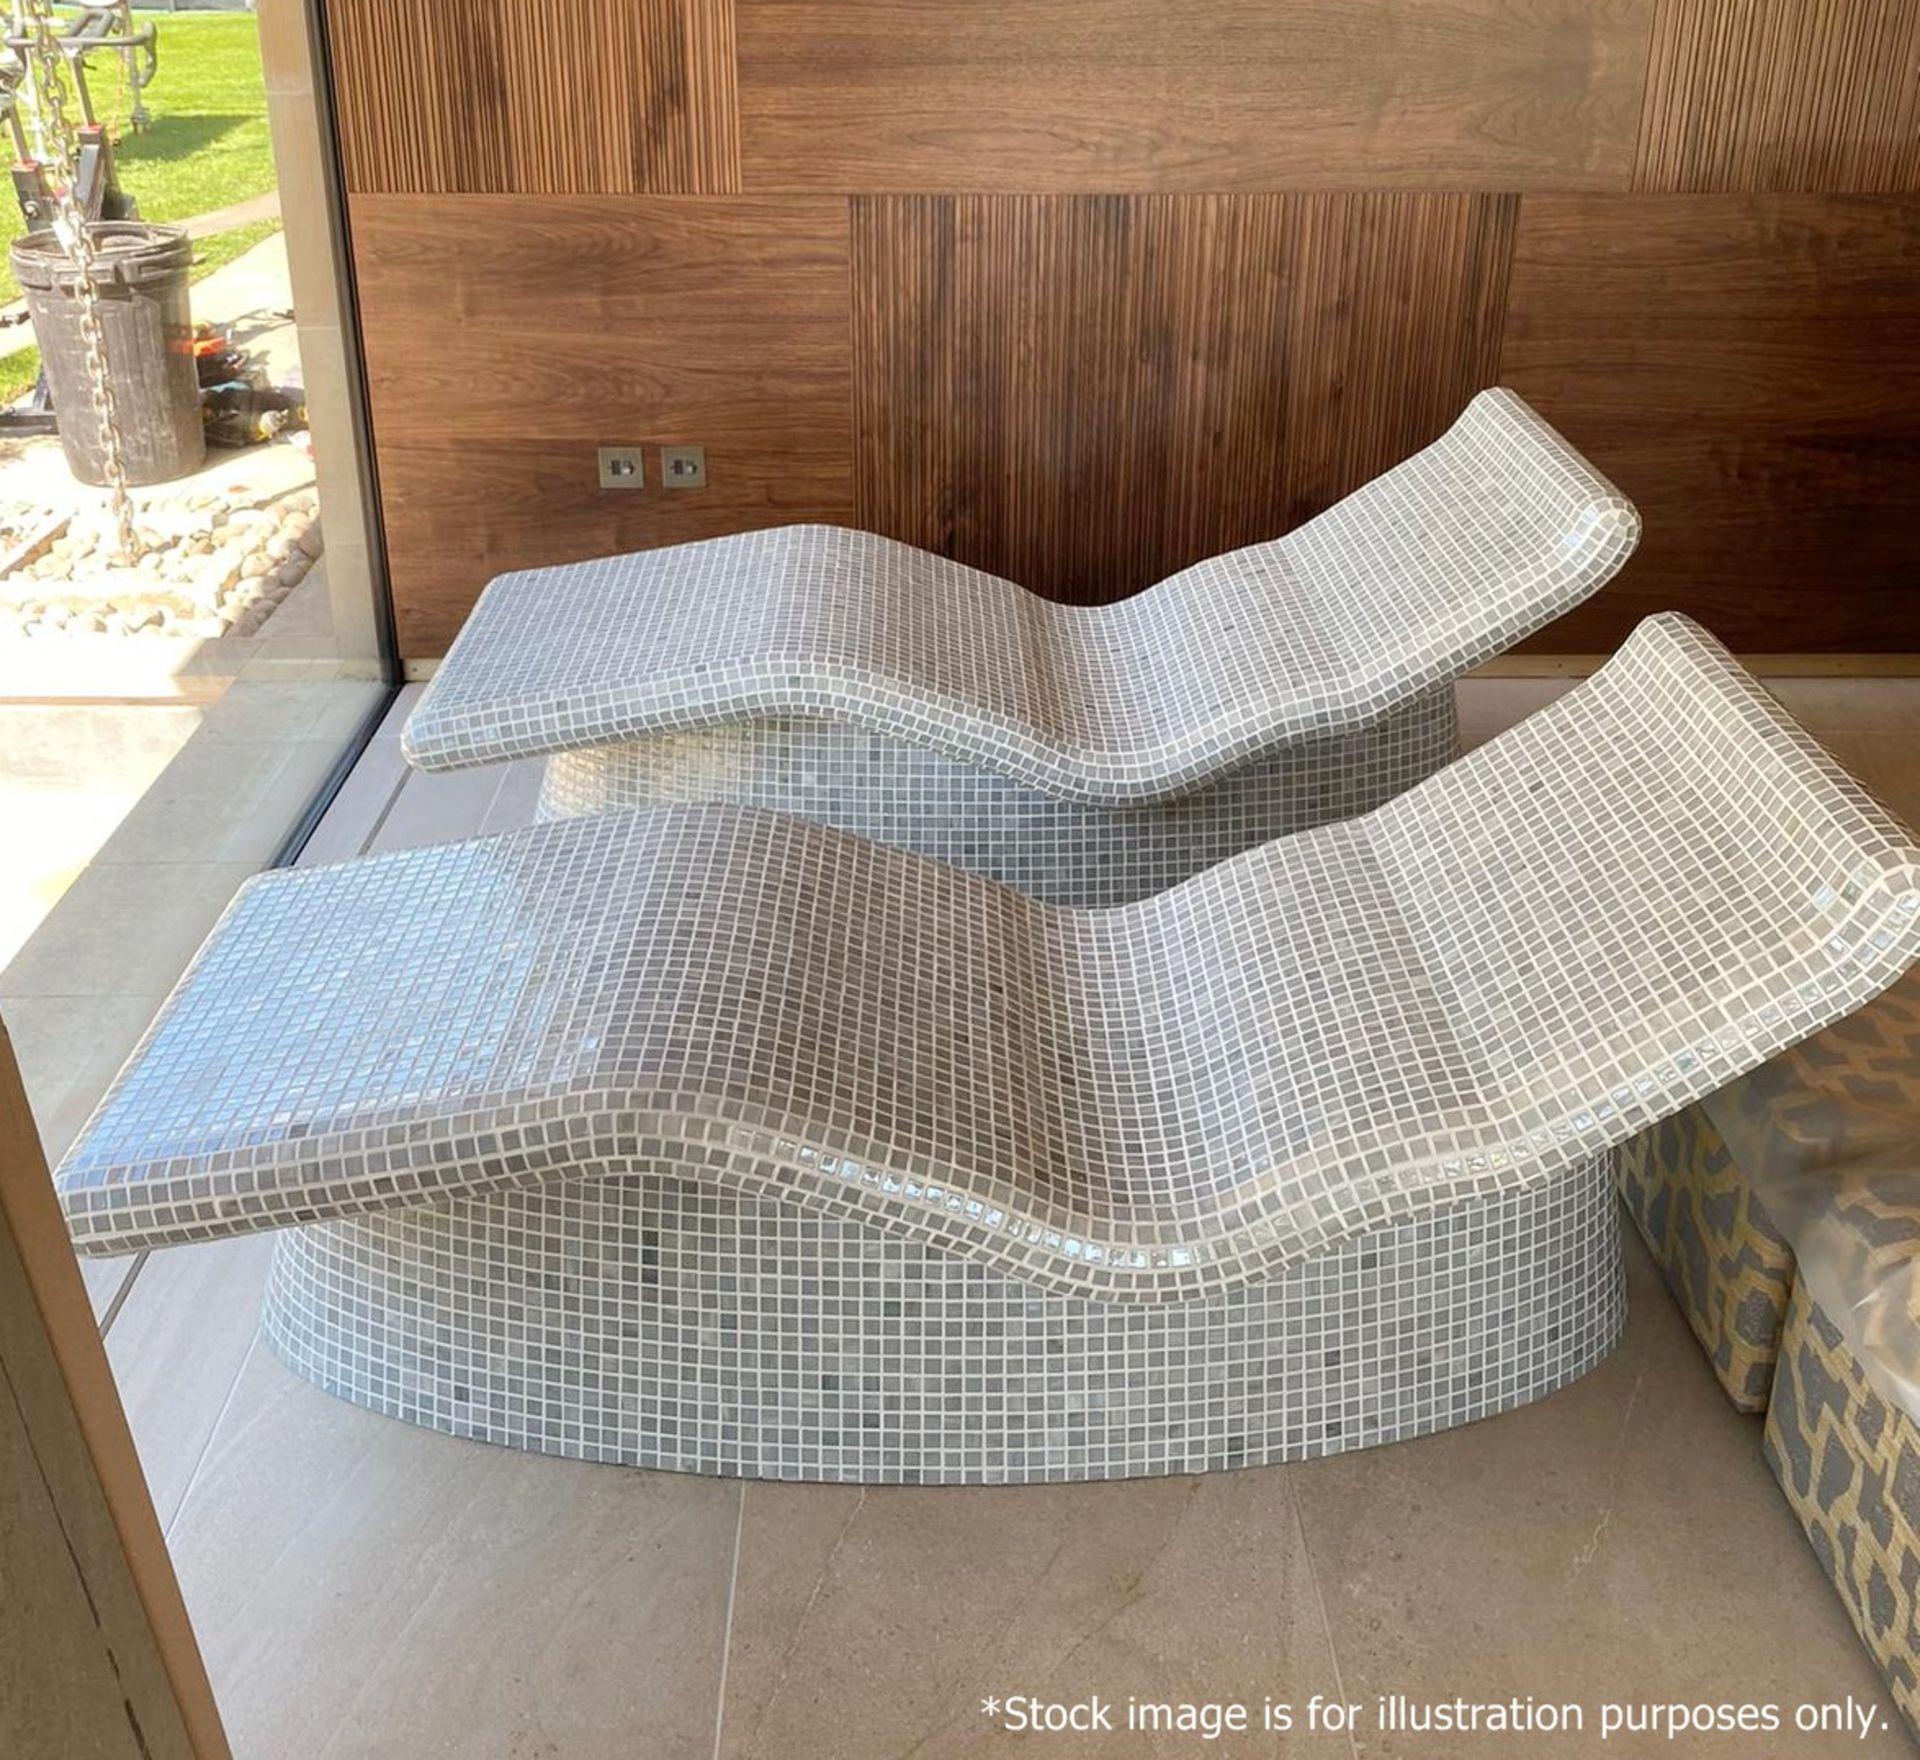 2 x Heated Sun Lounge Chairs - Brand New / Unused - Original Price £8,000 - CL636 - Location: